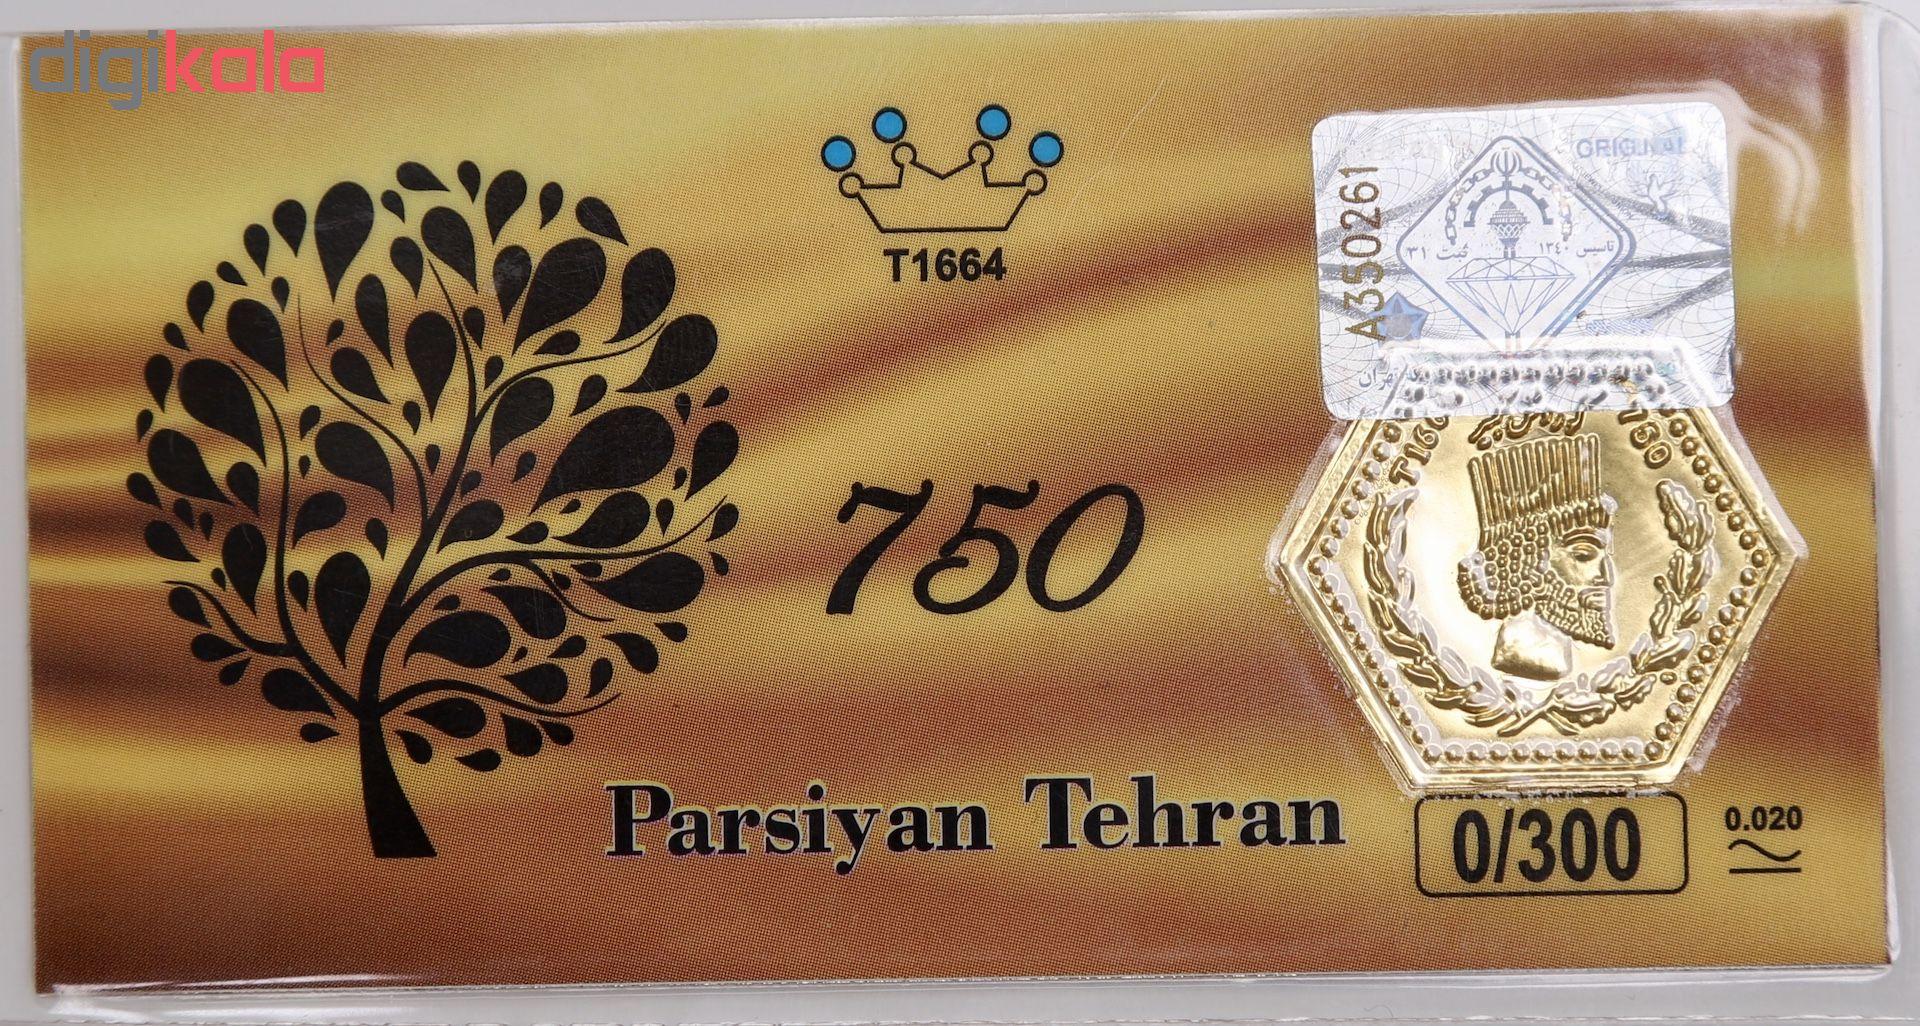 پلاک طلا 18 عیار پارسیان گوی گالری کد P300 main 1 1